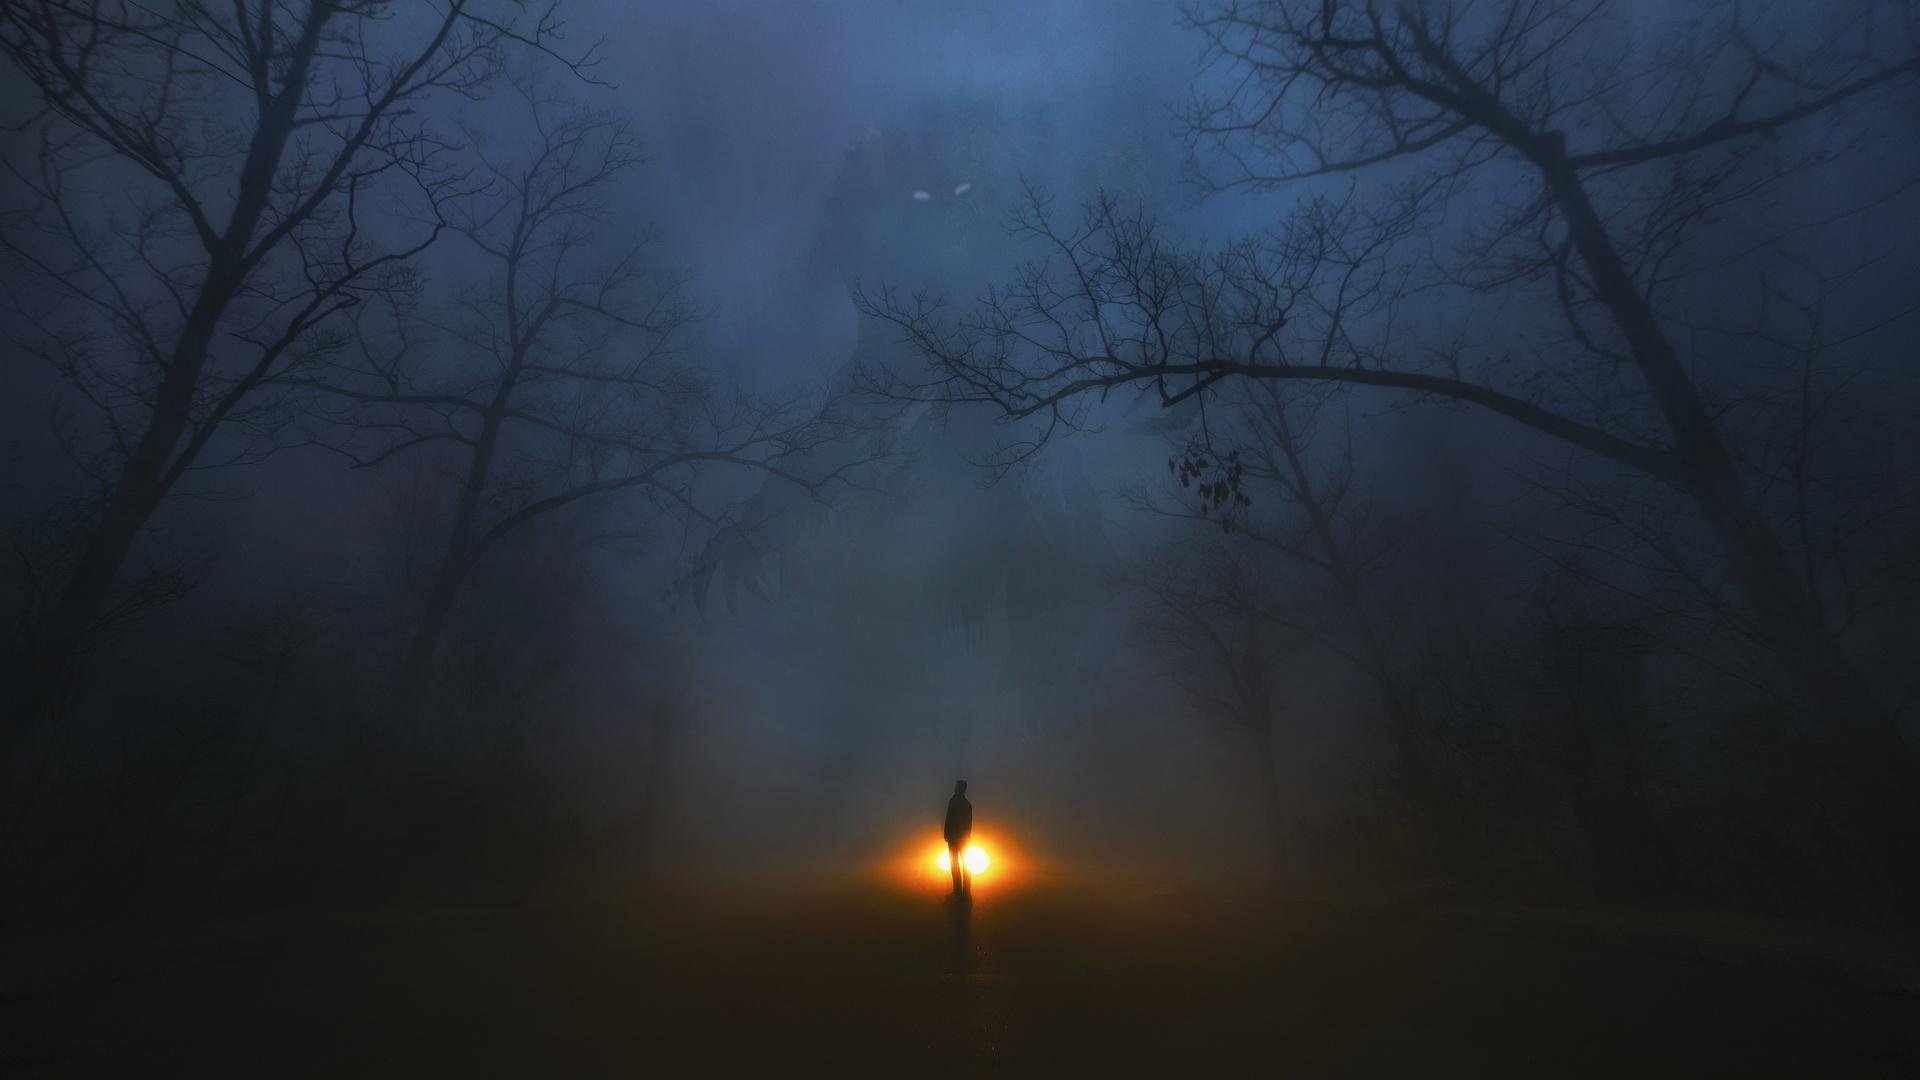 Ночная мгла картинки